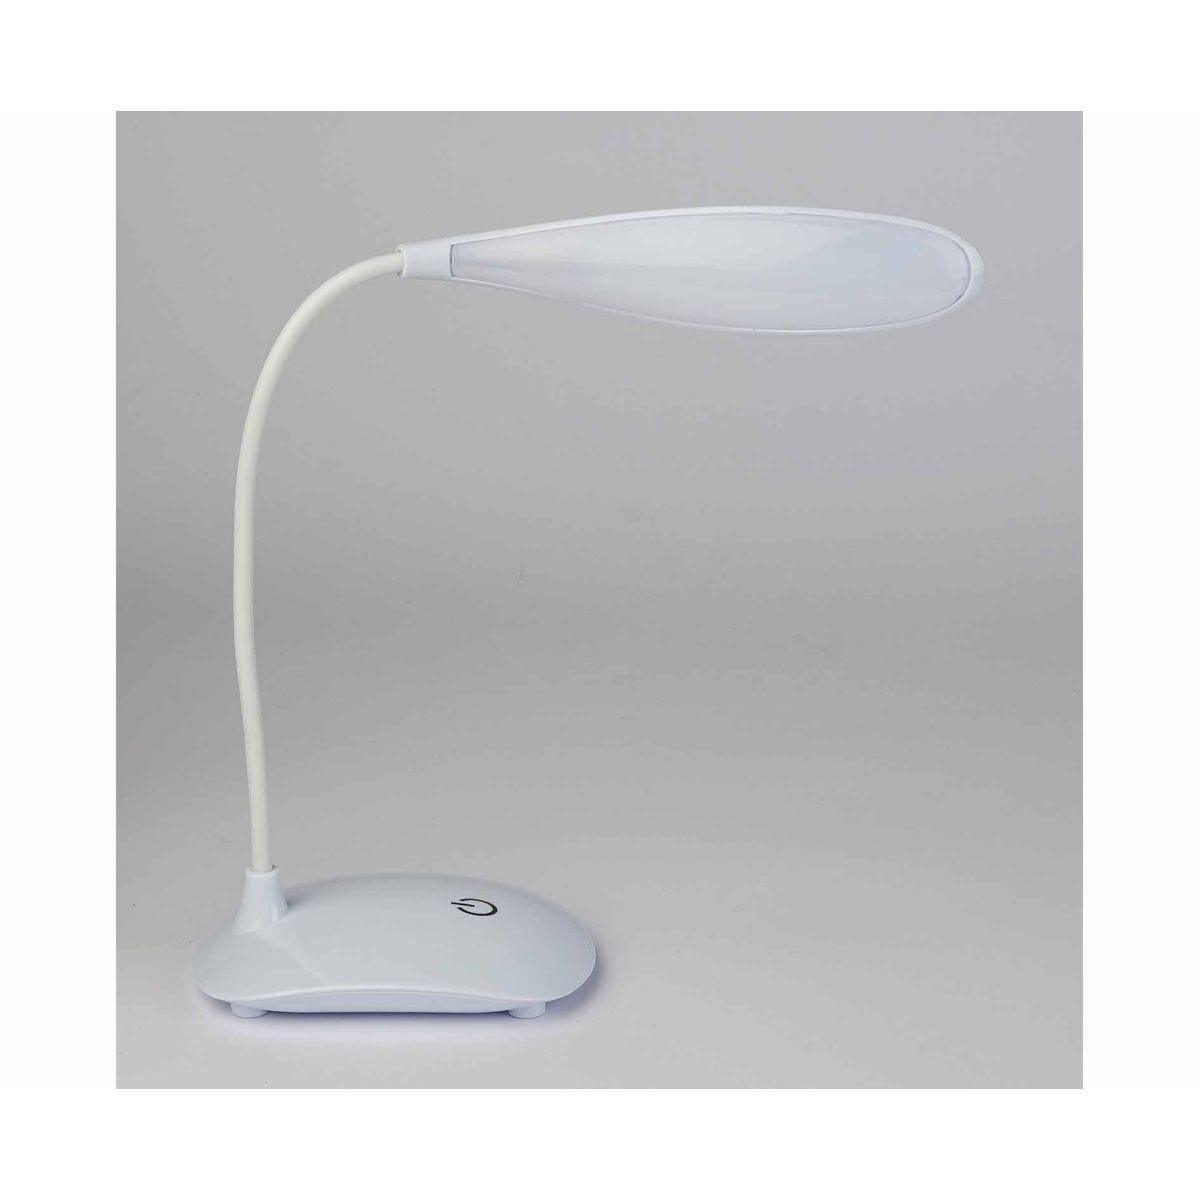 Adjustable USB Desk Lamp White